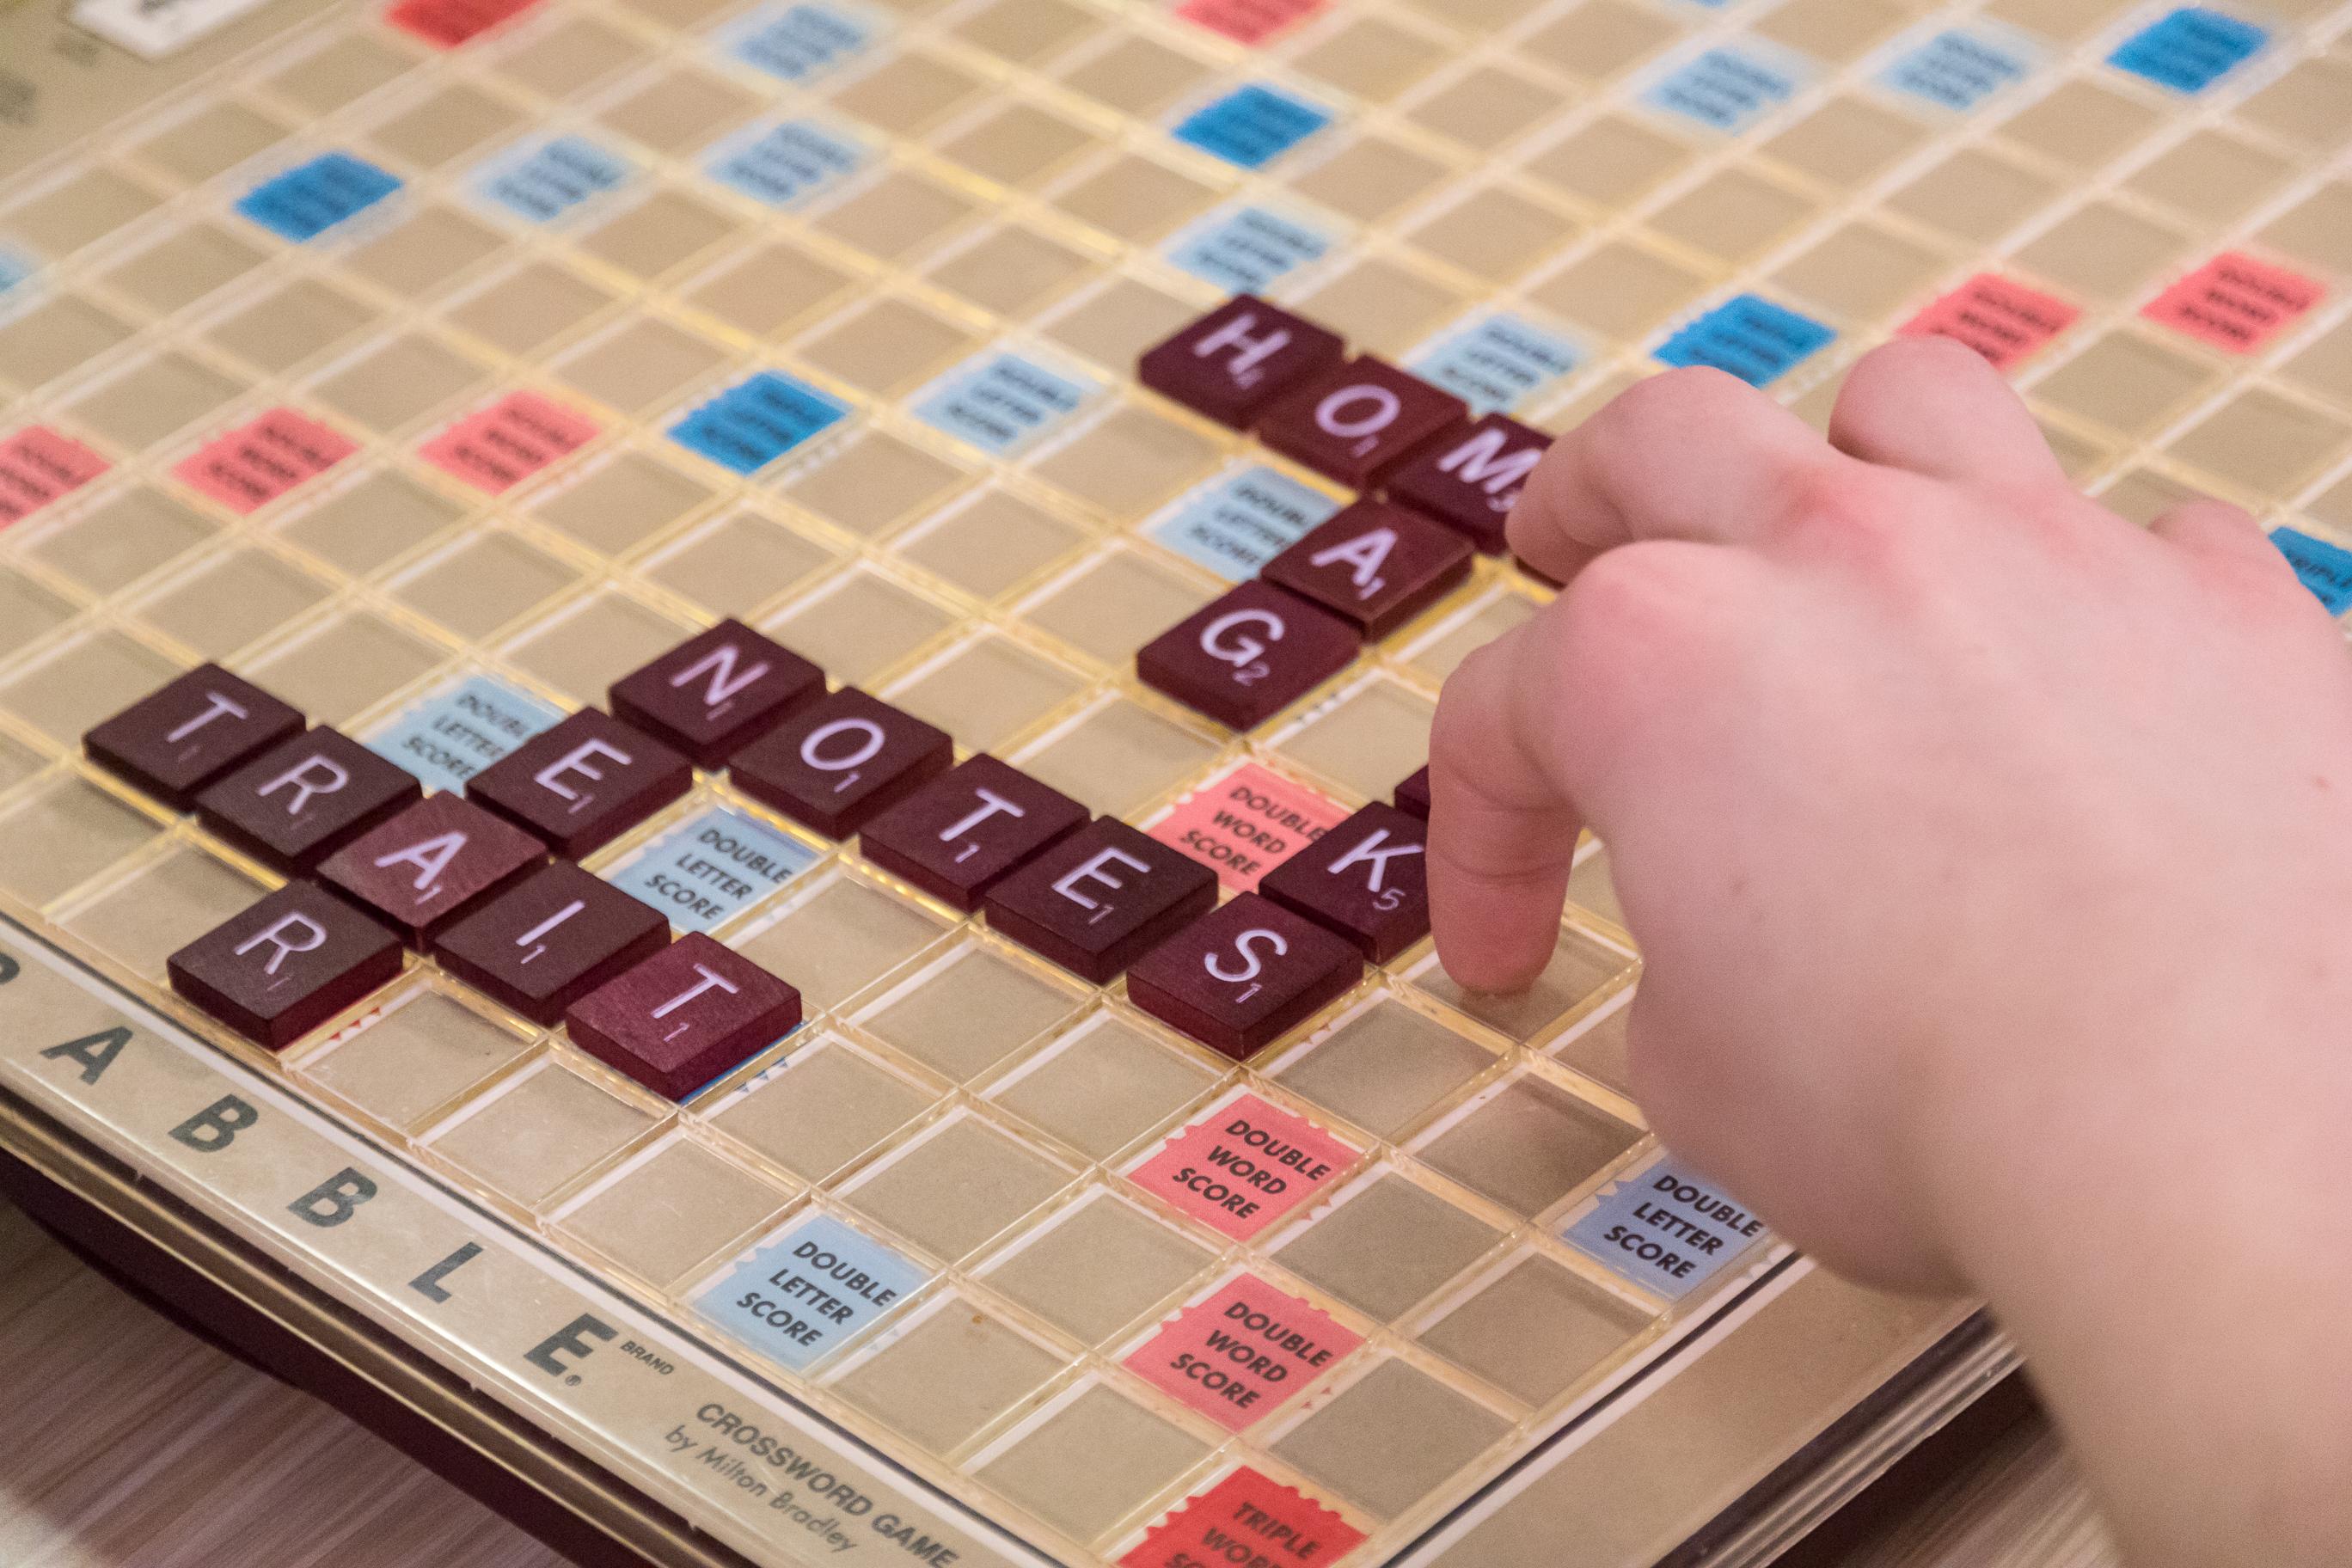 Scrabble board game closeup.